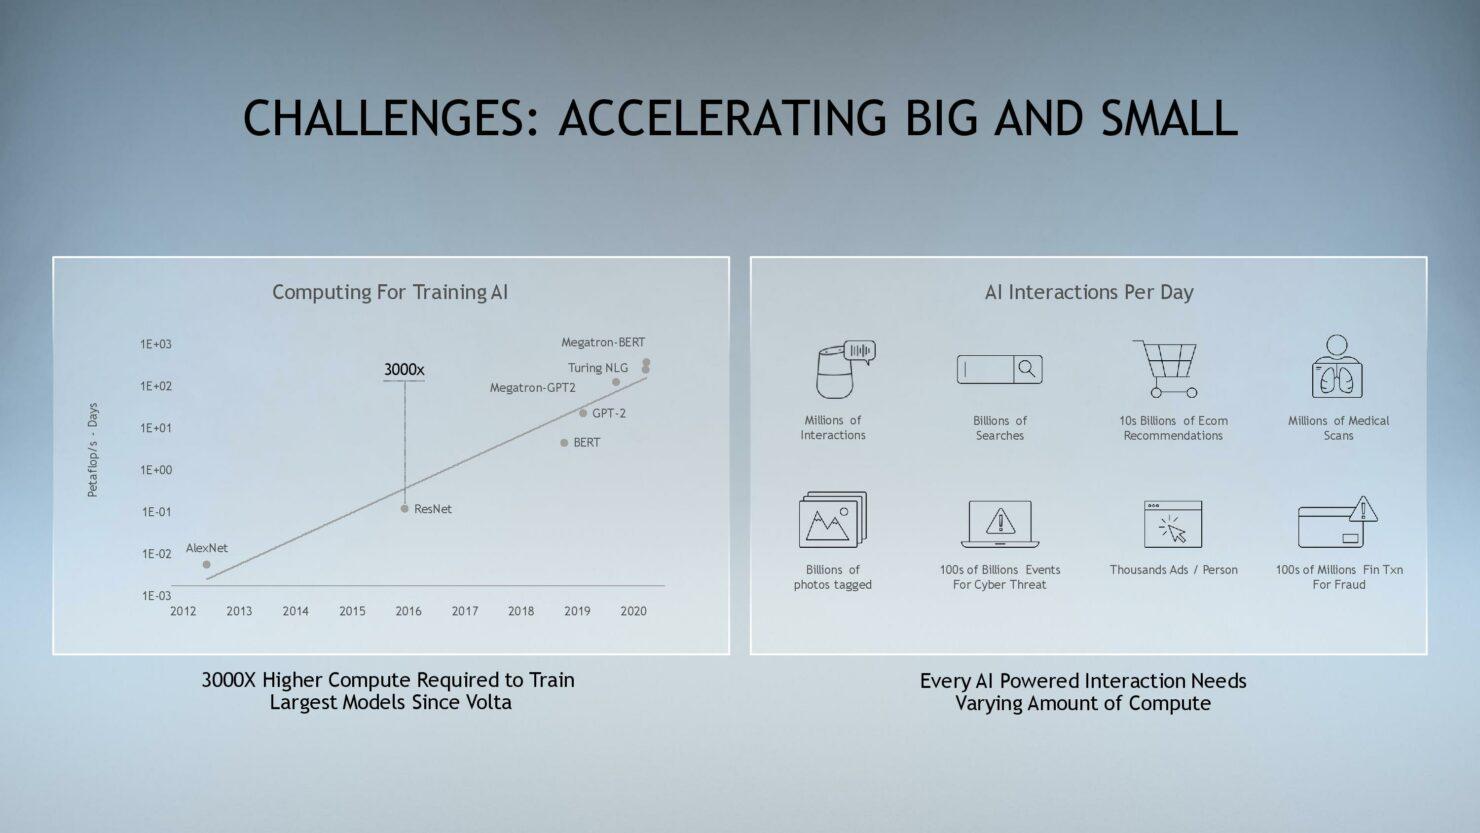 nvda-1qfy21-investor-presentation-5-21-20-final-page-020